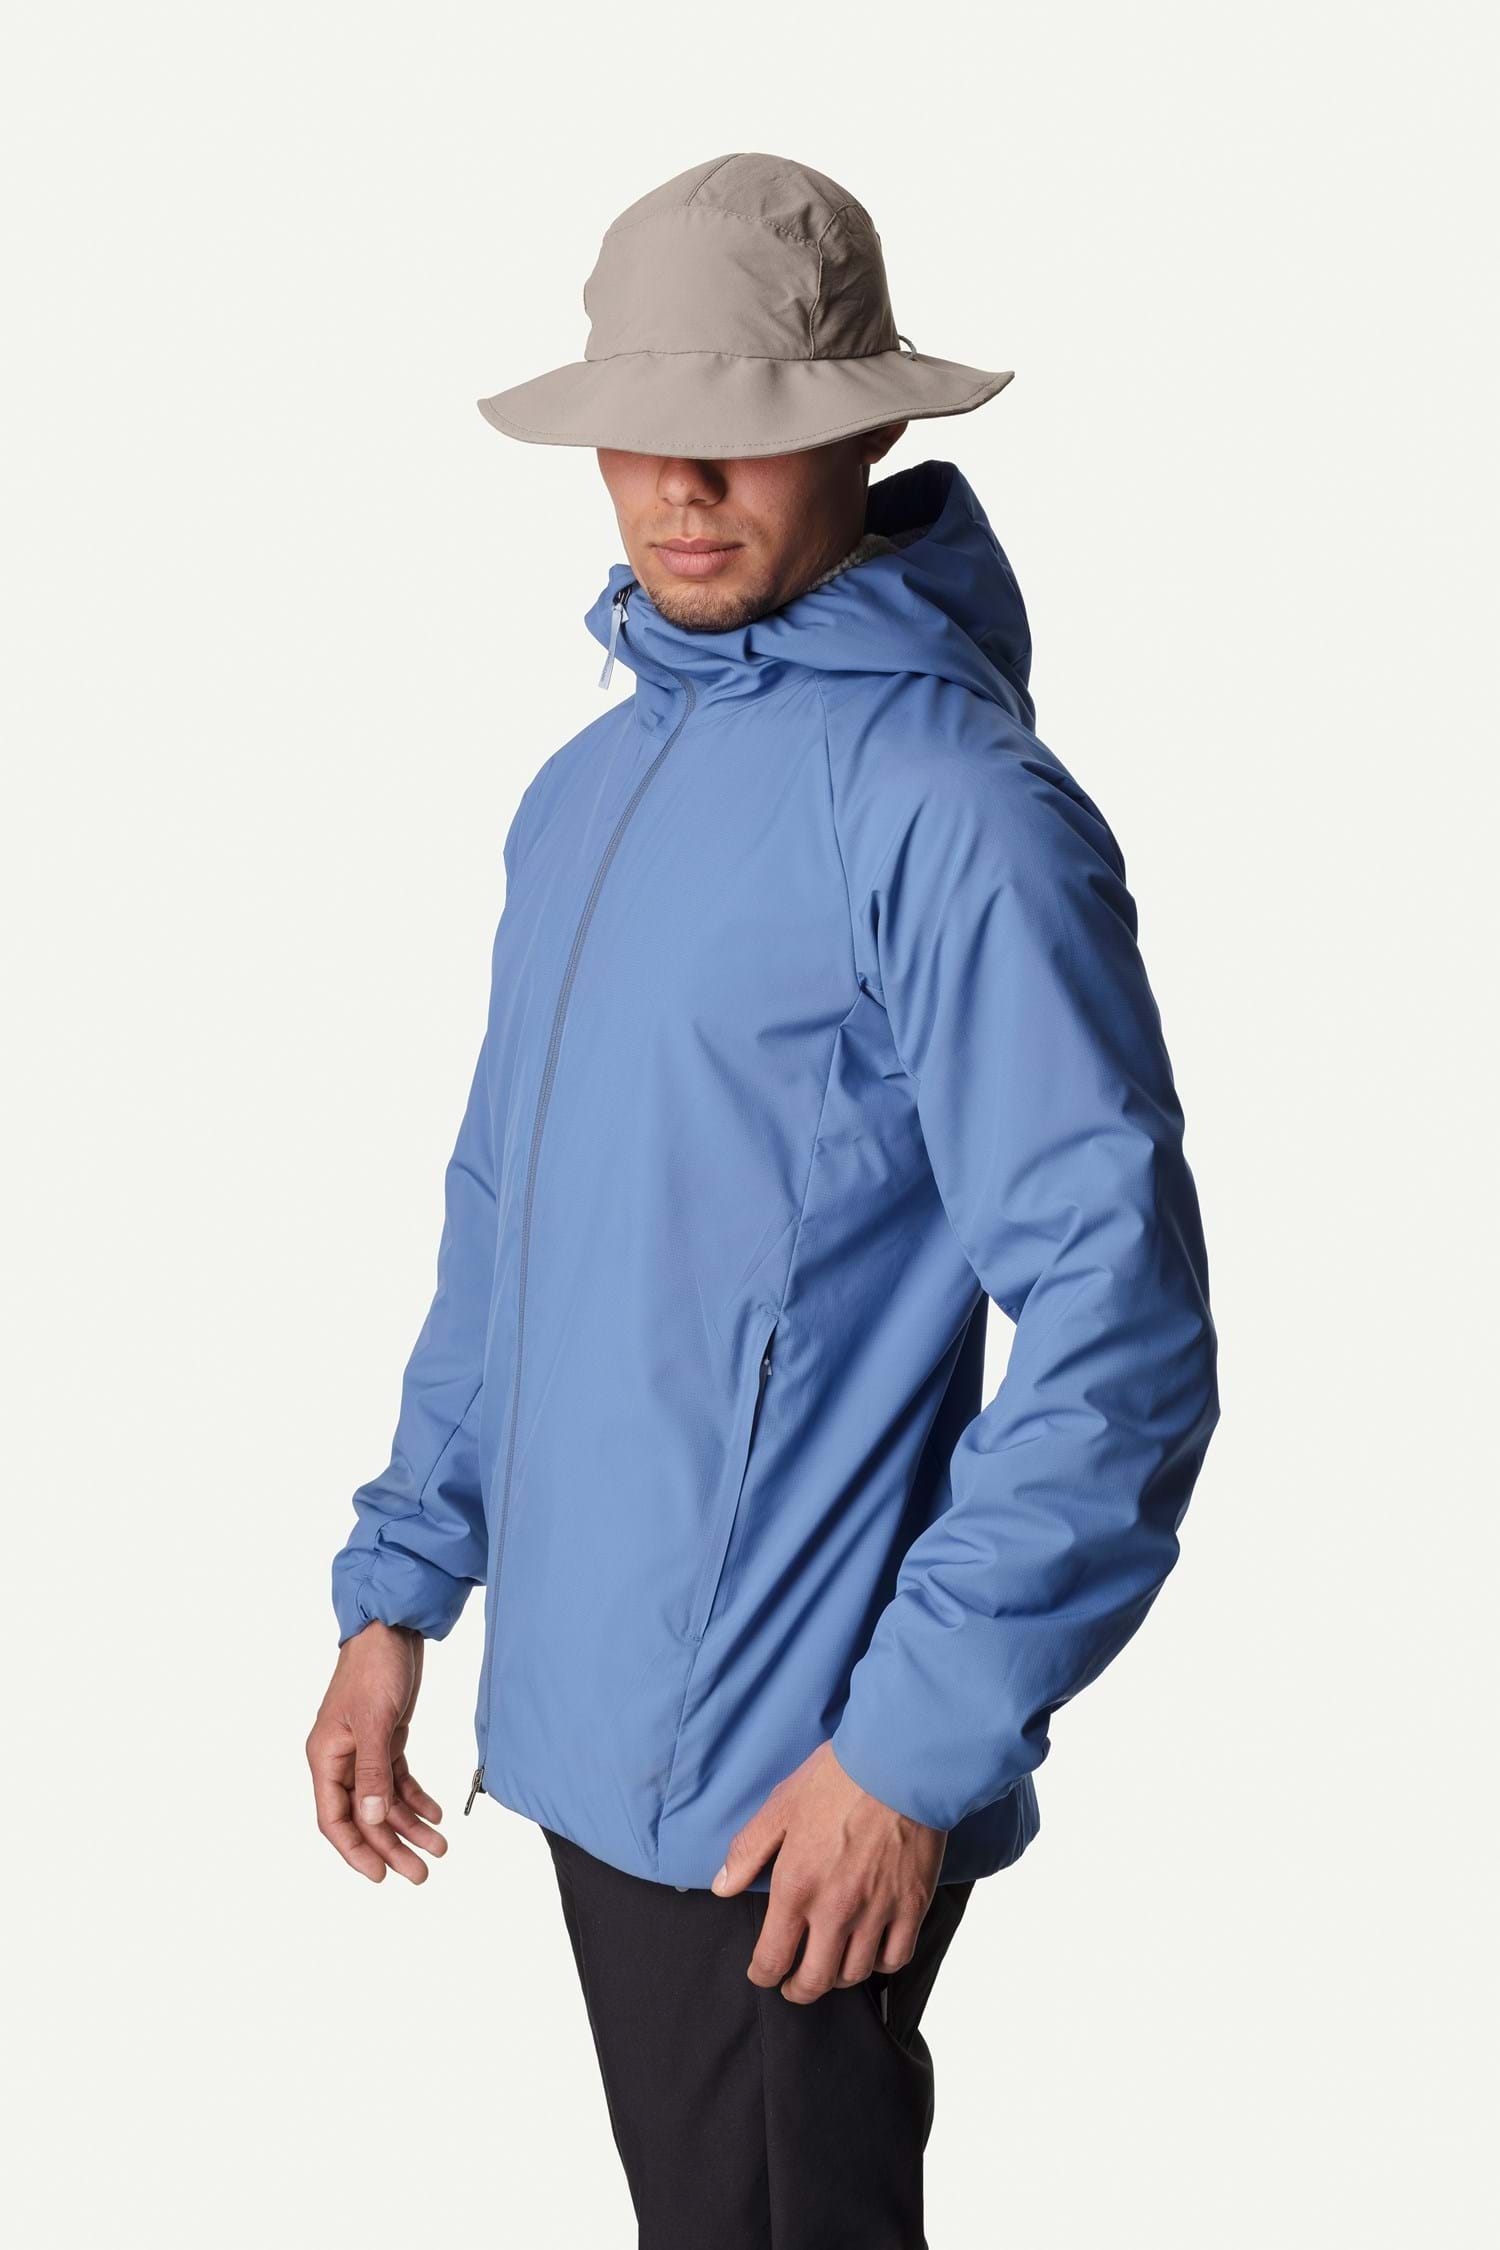 0a6f1ed2439 Shop Houdini Sportswear